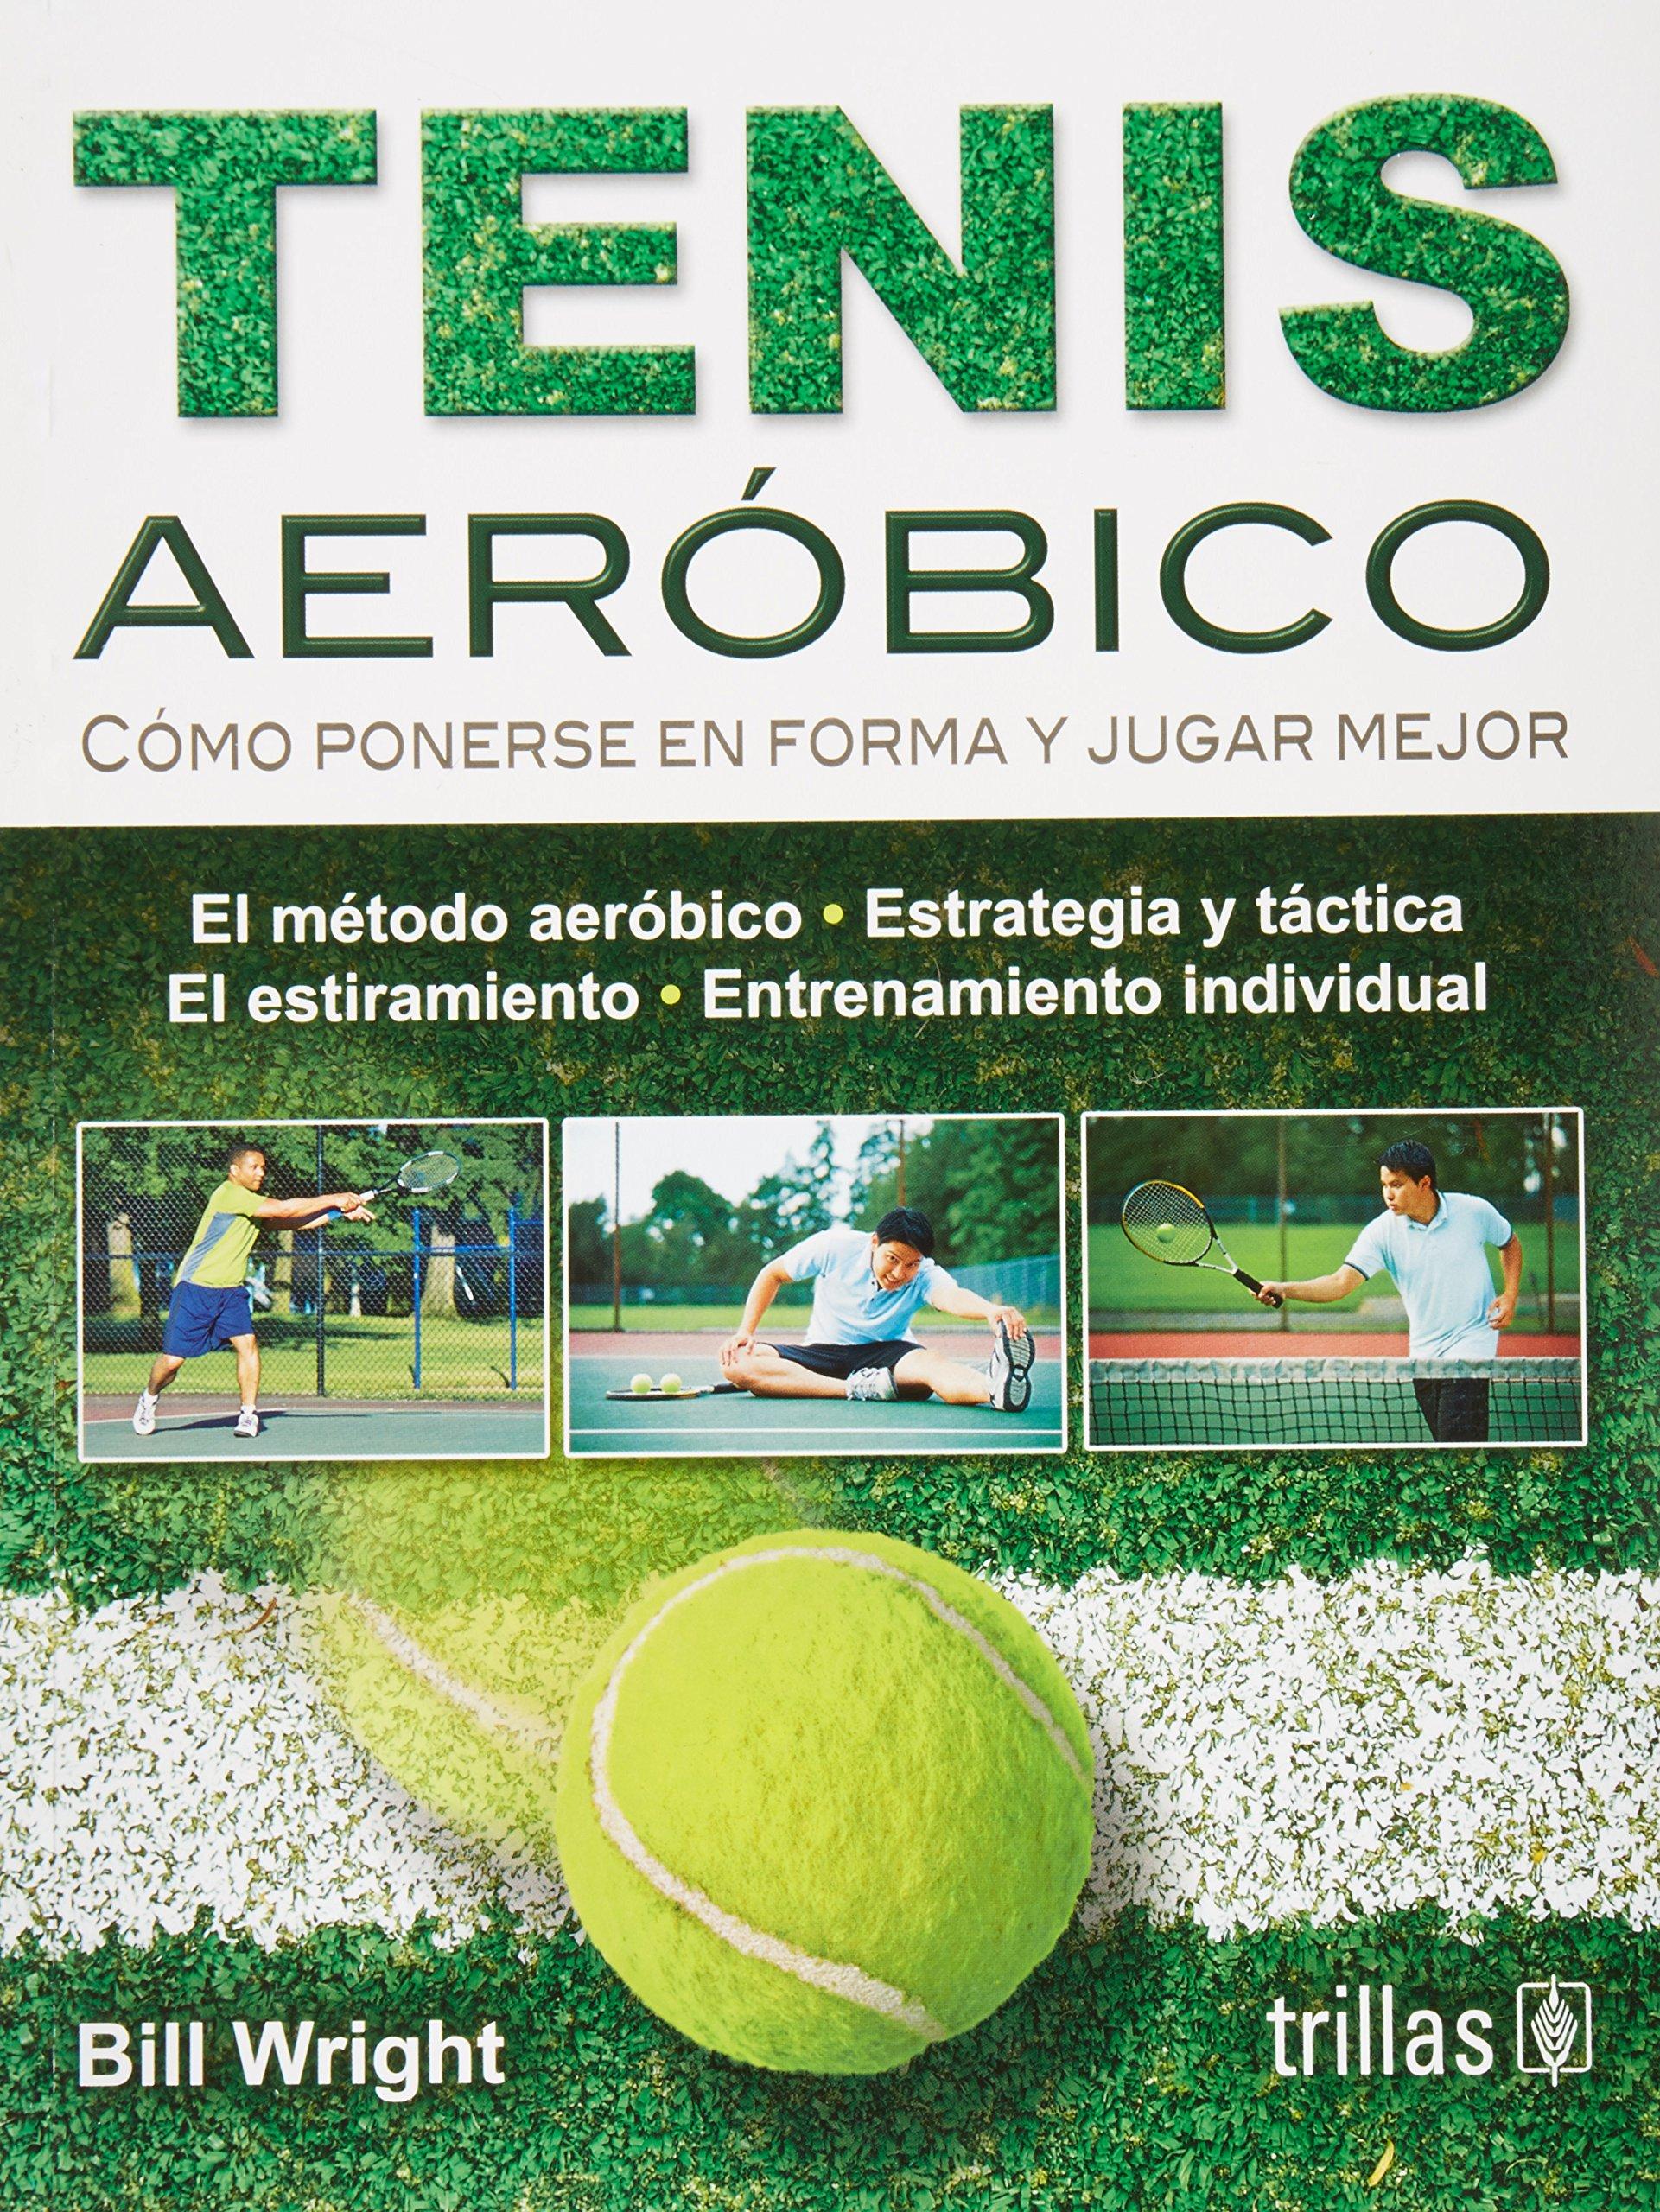 Tenis aerobico / Aerobic Tennis (Spanish Edition) (Spanish) Paperback – June 10, 2011